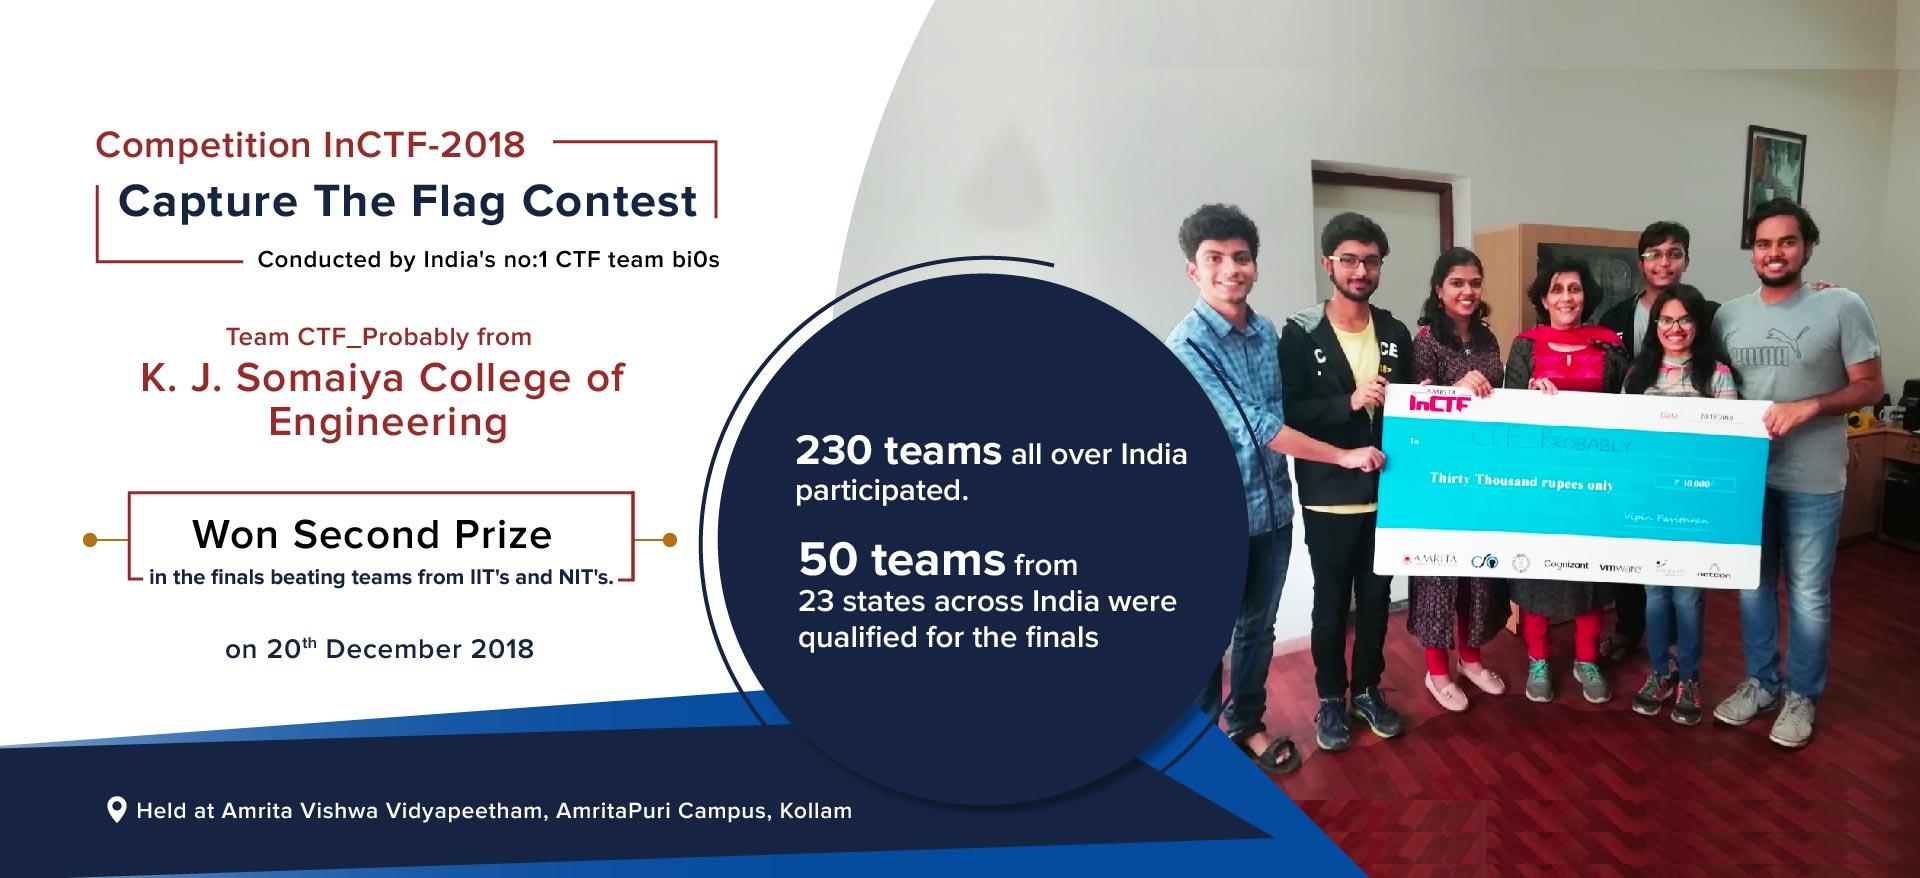 Competition InCTF-2018